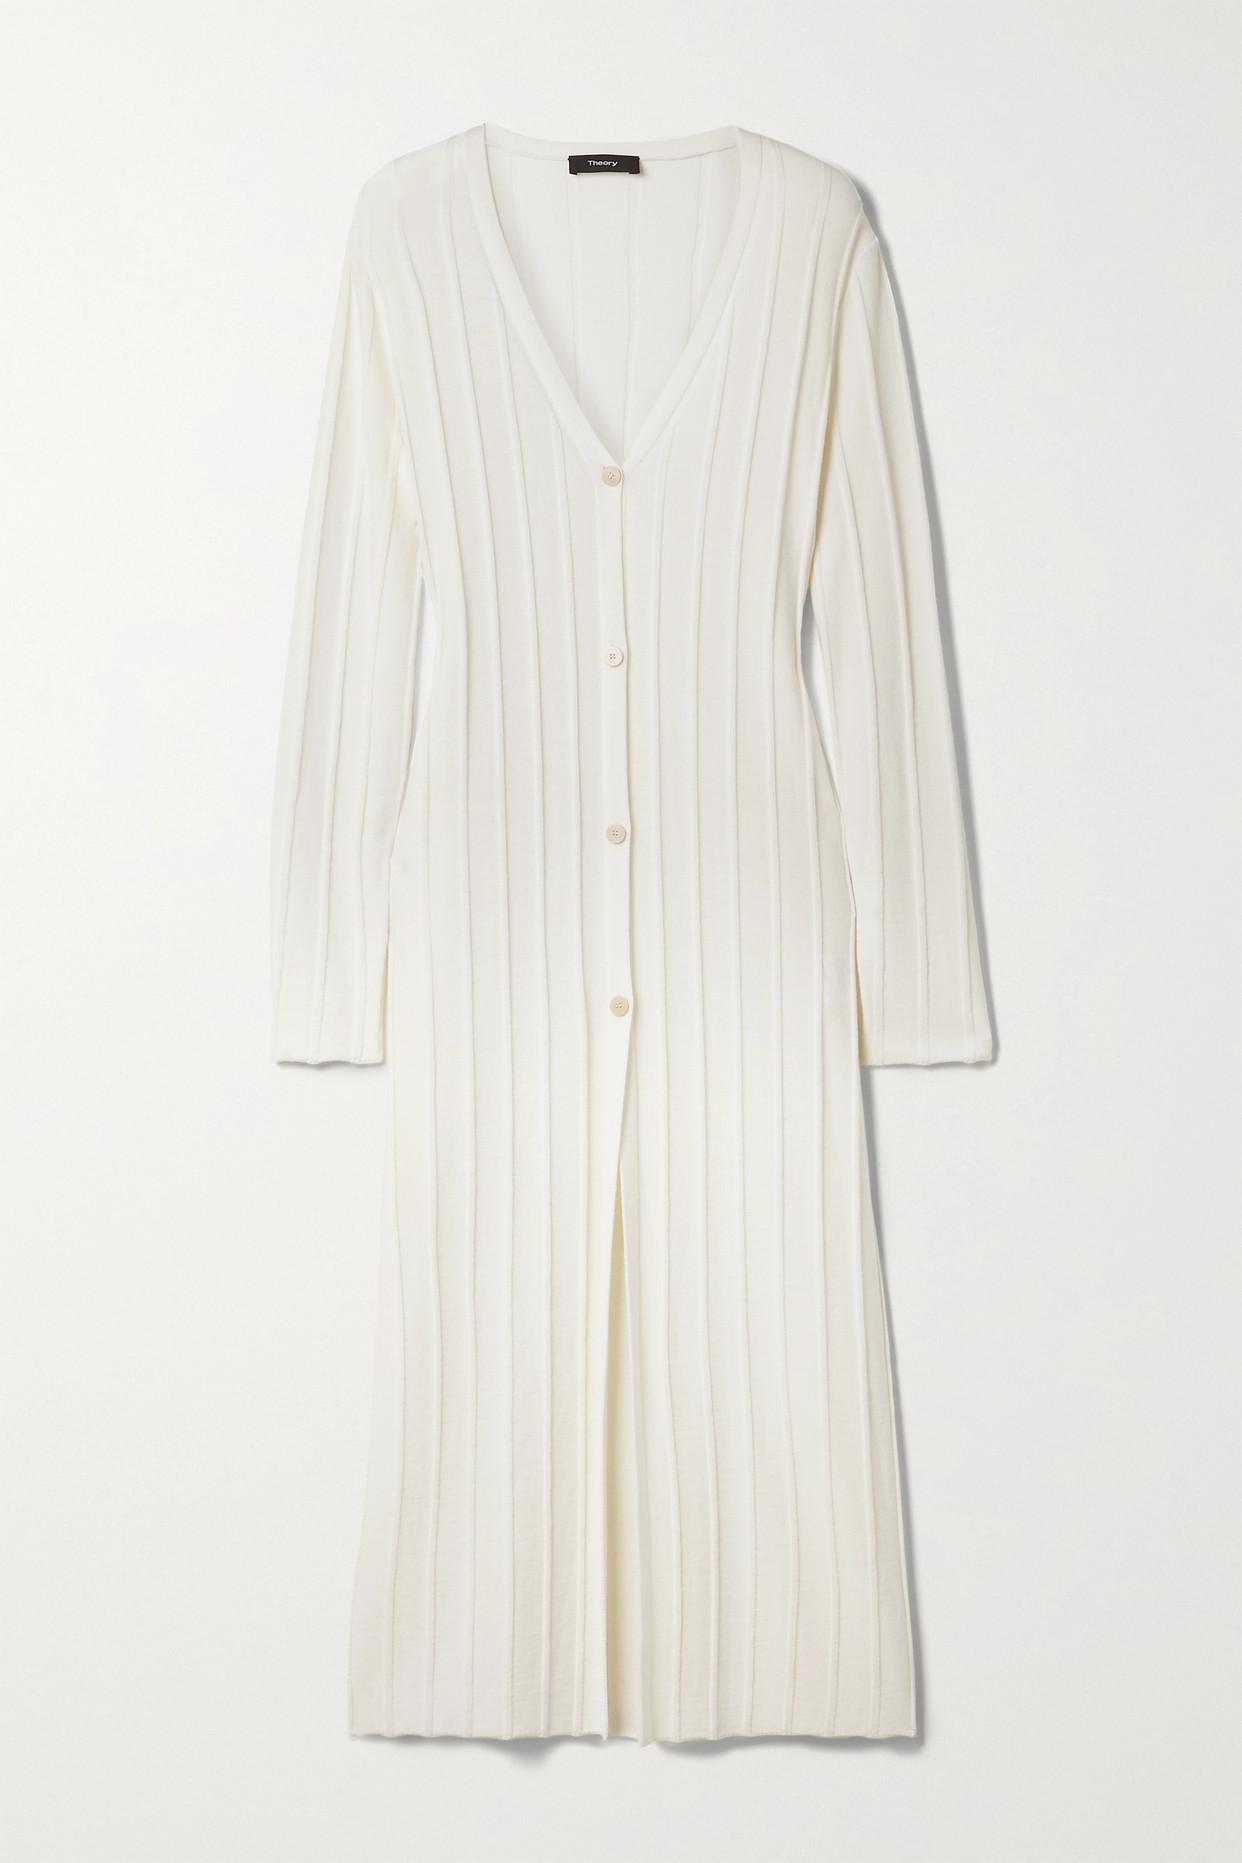 THEORY - Ribbed Merino Wool Cardigan - Ivory - small